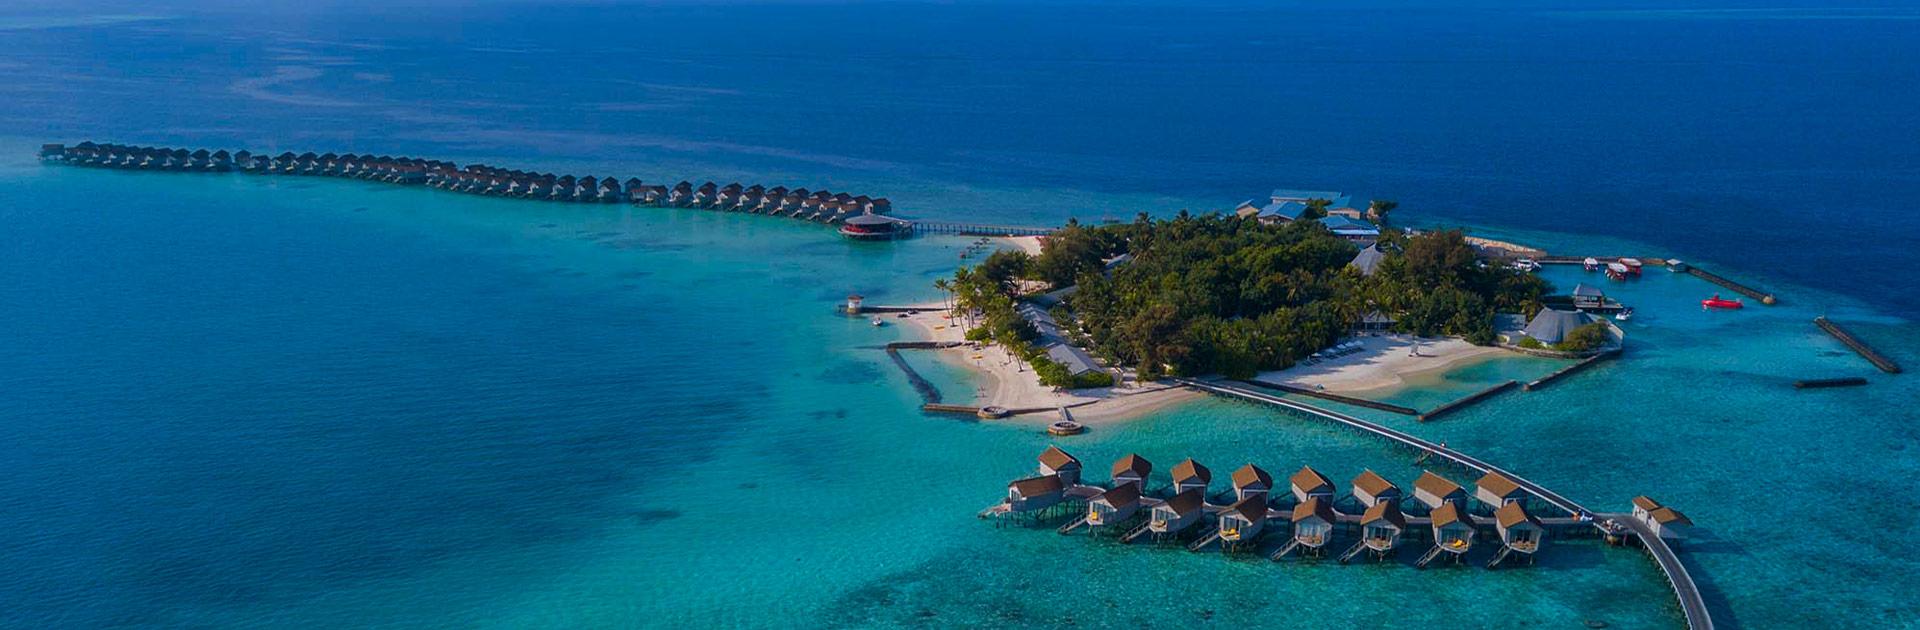 Ras Fushi maldives drone 17 2000x925 1